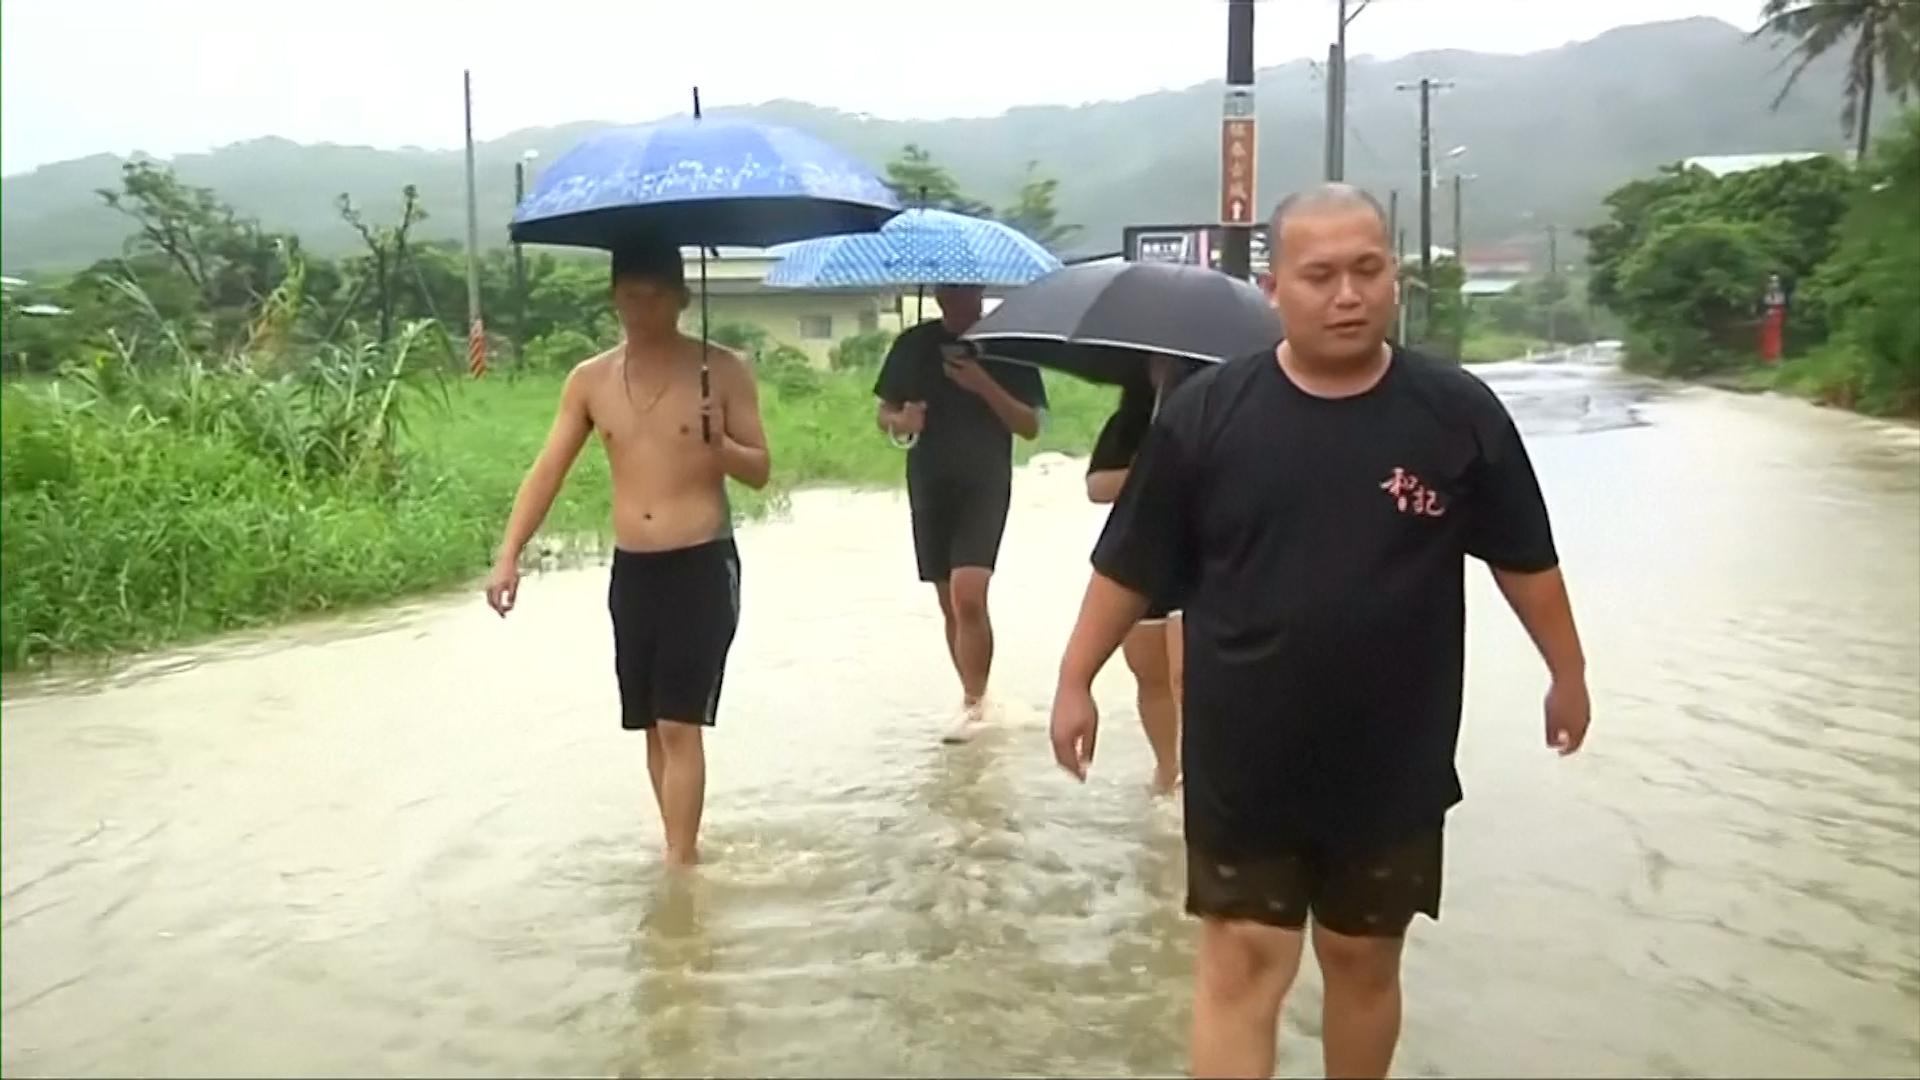 Typhoon Bailu wreaks havoc in Taiwan, East Asia News & Top Stories